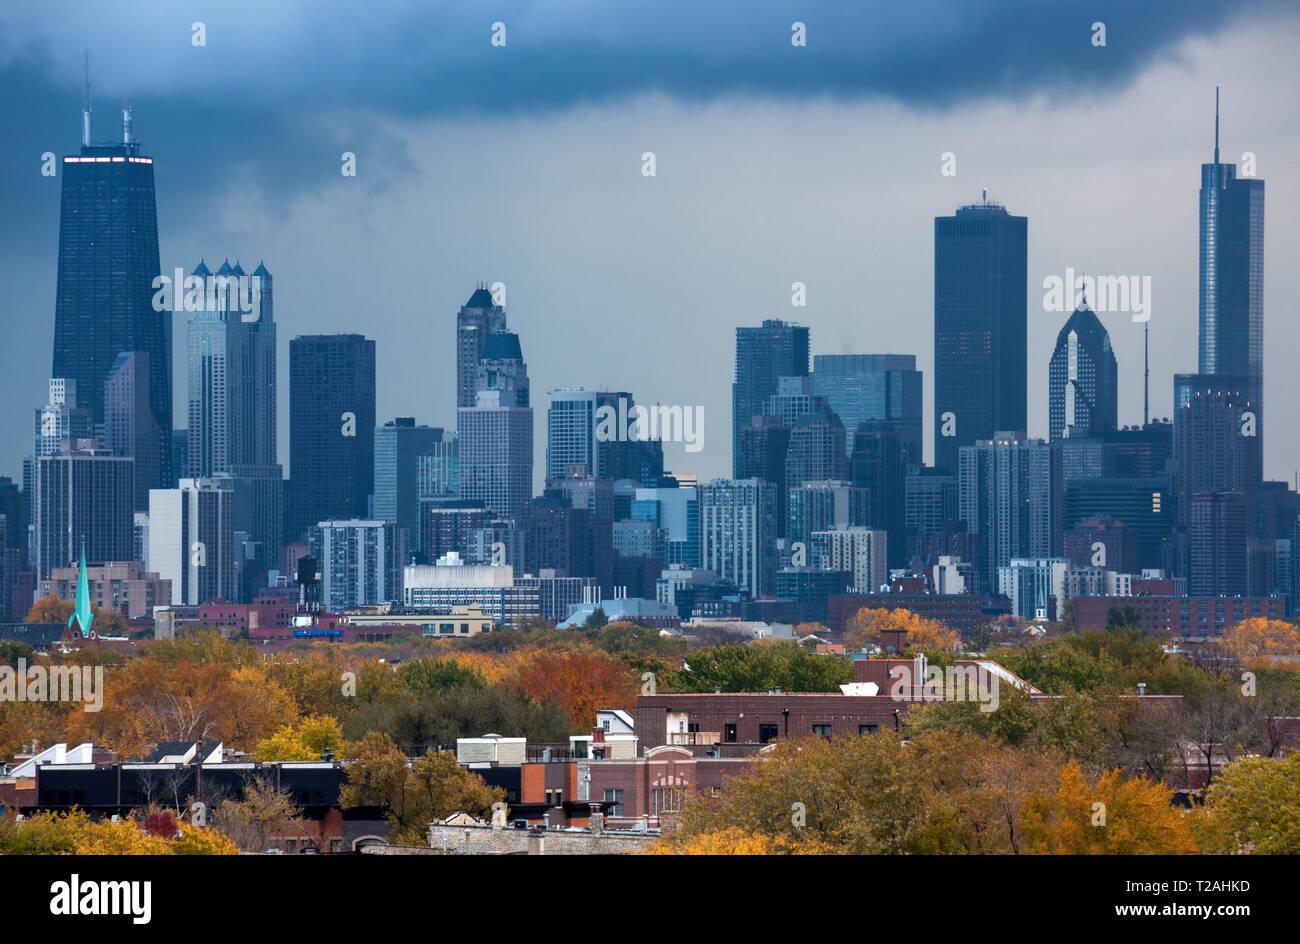 Skyline de Chicago, Illinois, États-Unis Photo Stock